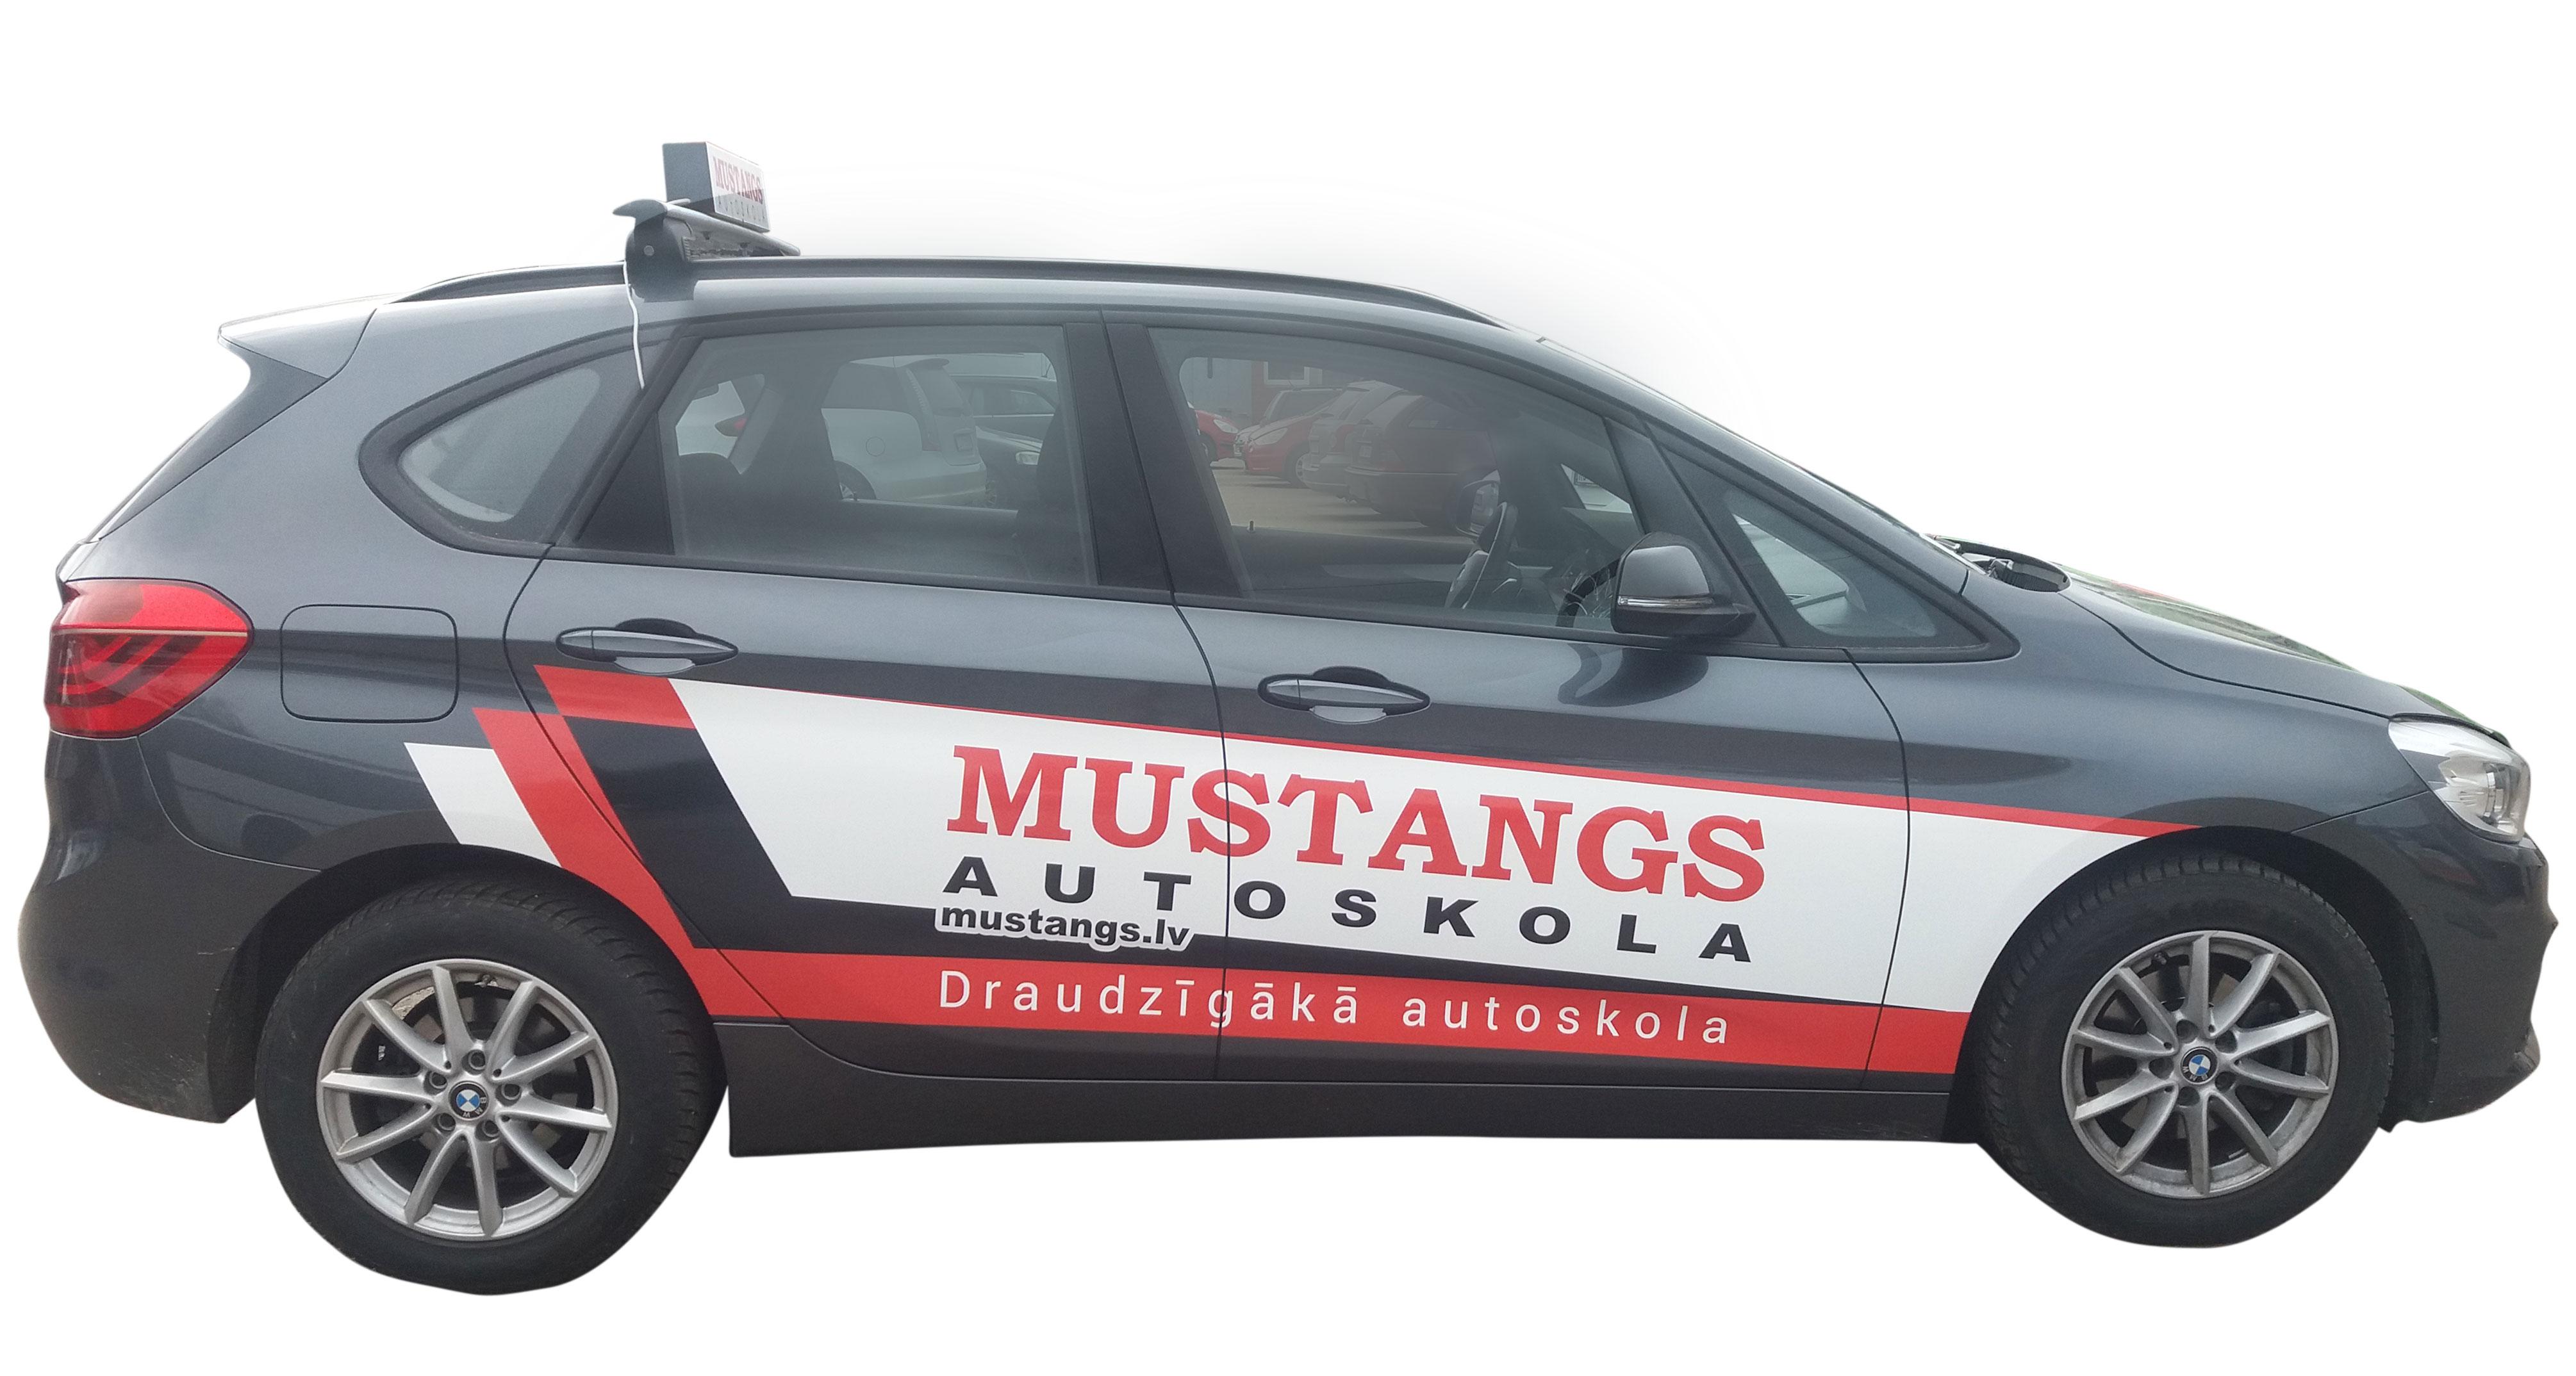 Mustangs1_web